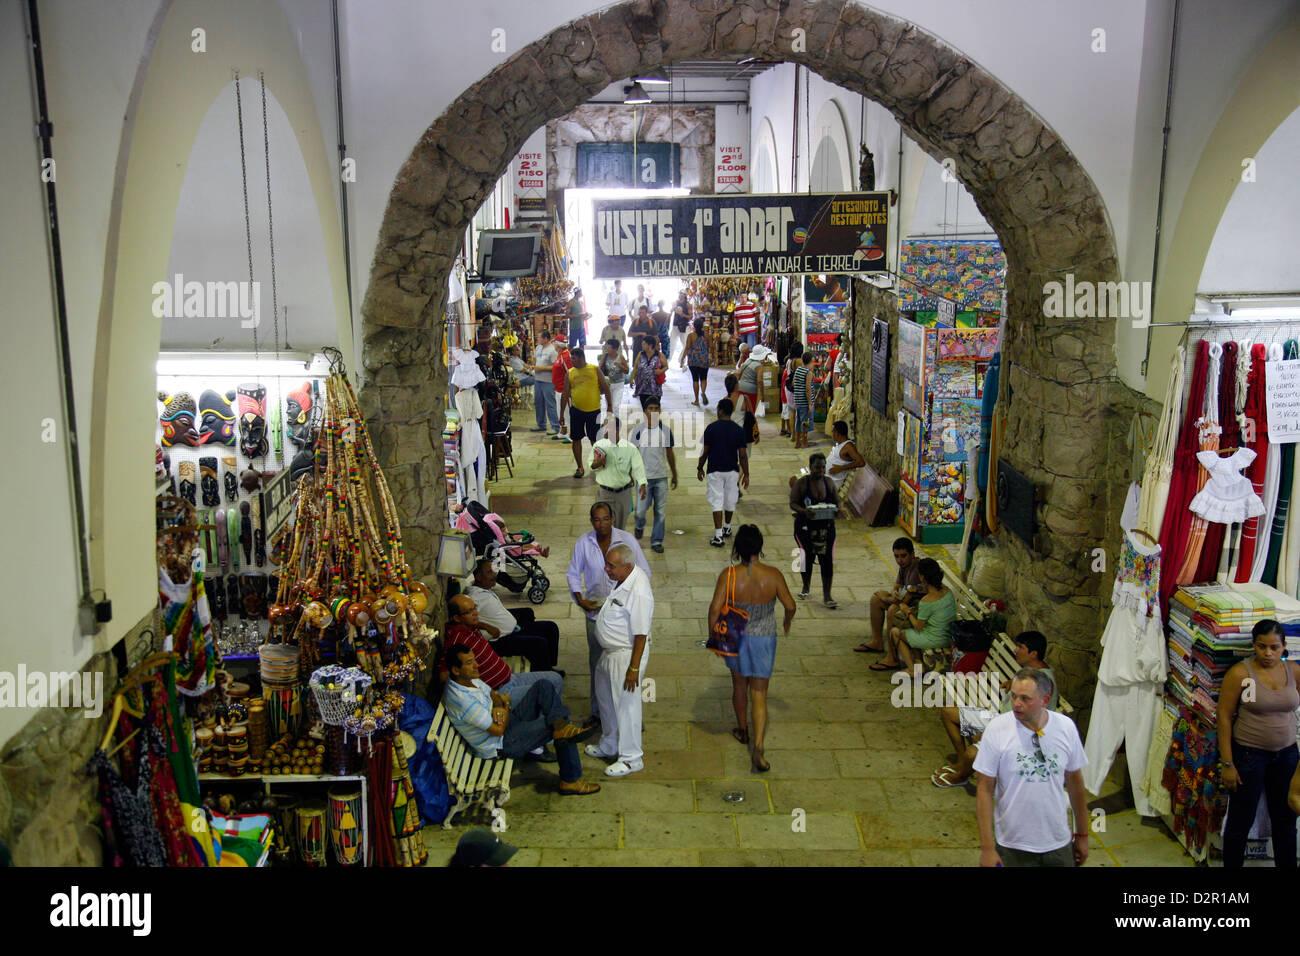 Mercado Modelo, Salvador (Salvador de Bahia), Bahia, Brazil, South America - Stock Image